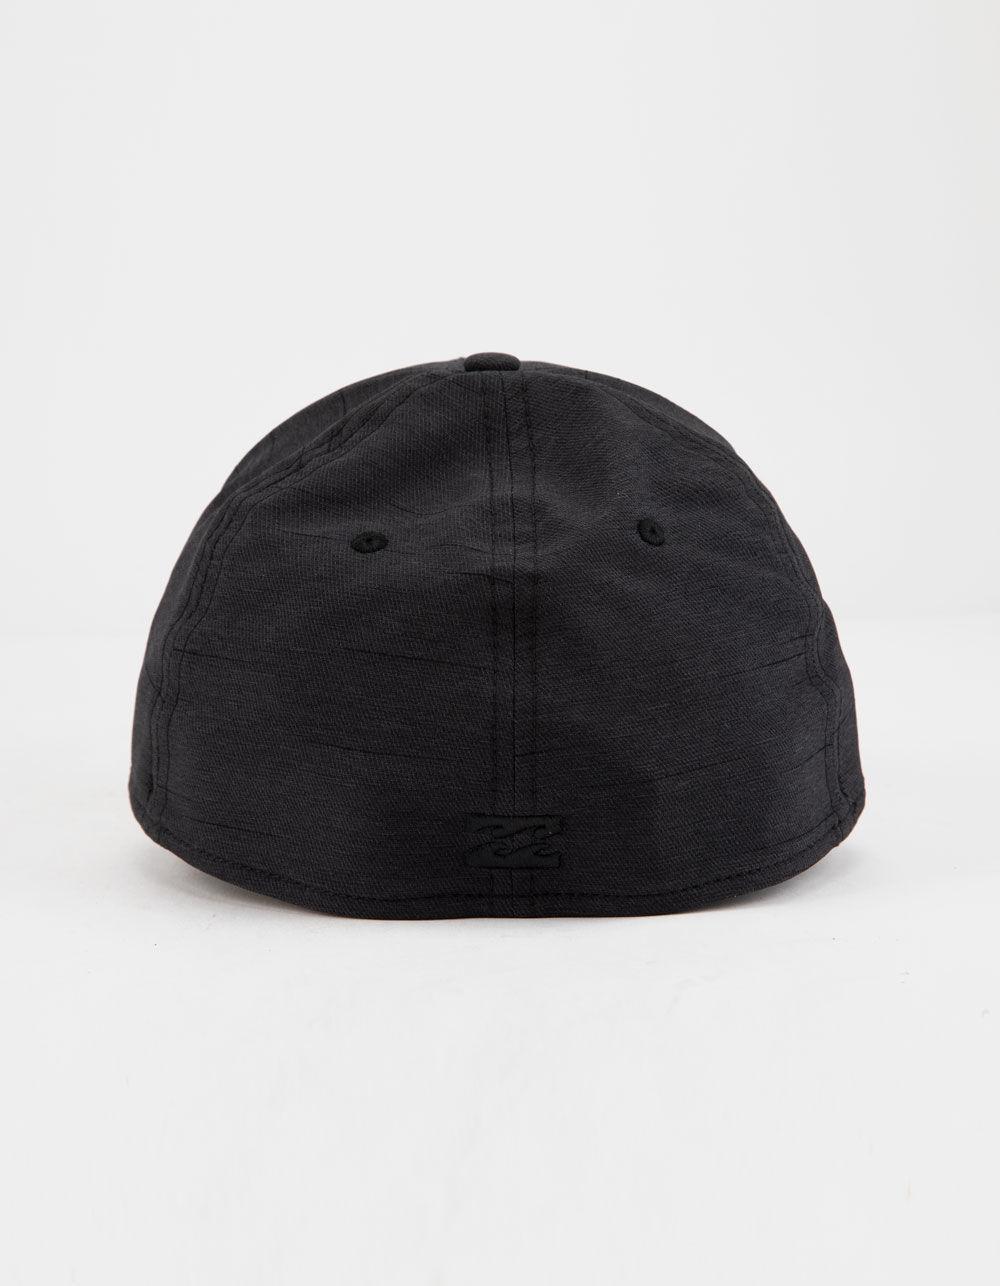 933bba11ba6 Lyst - Billabong Surftrek Black Mens Flexfit Hat in Black for Men